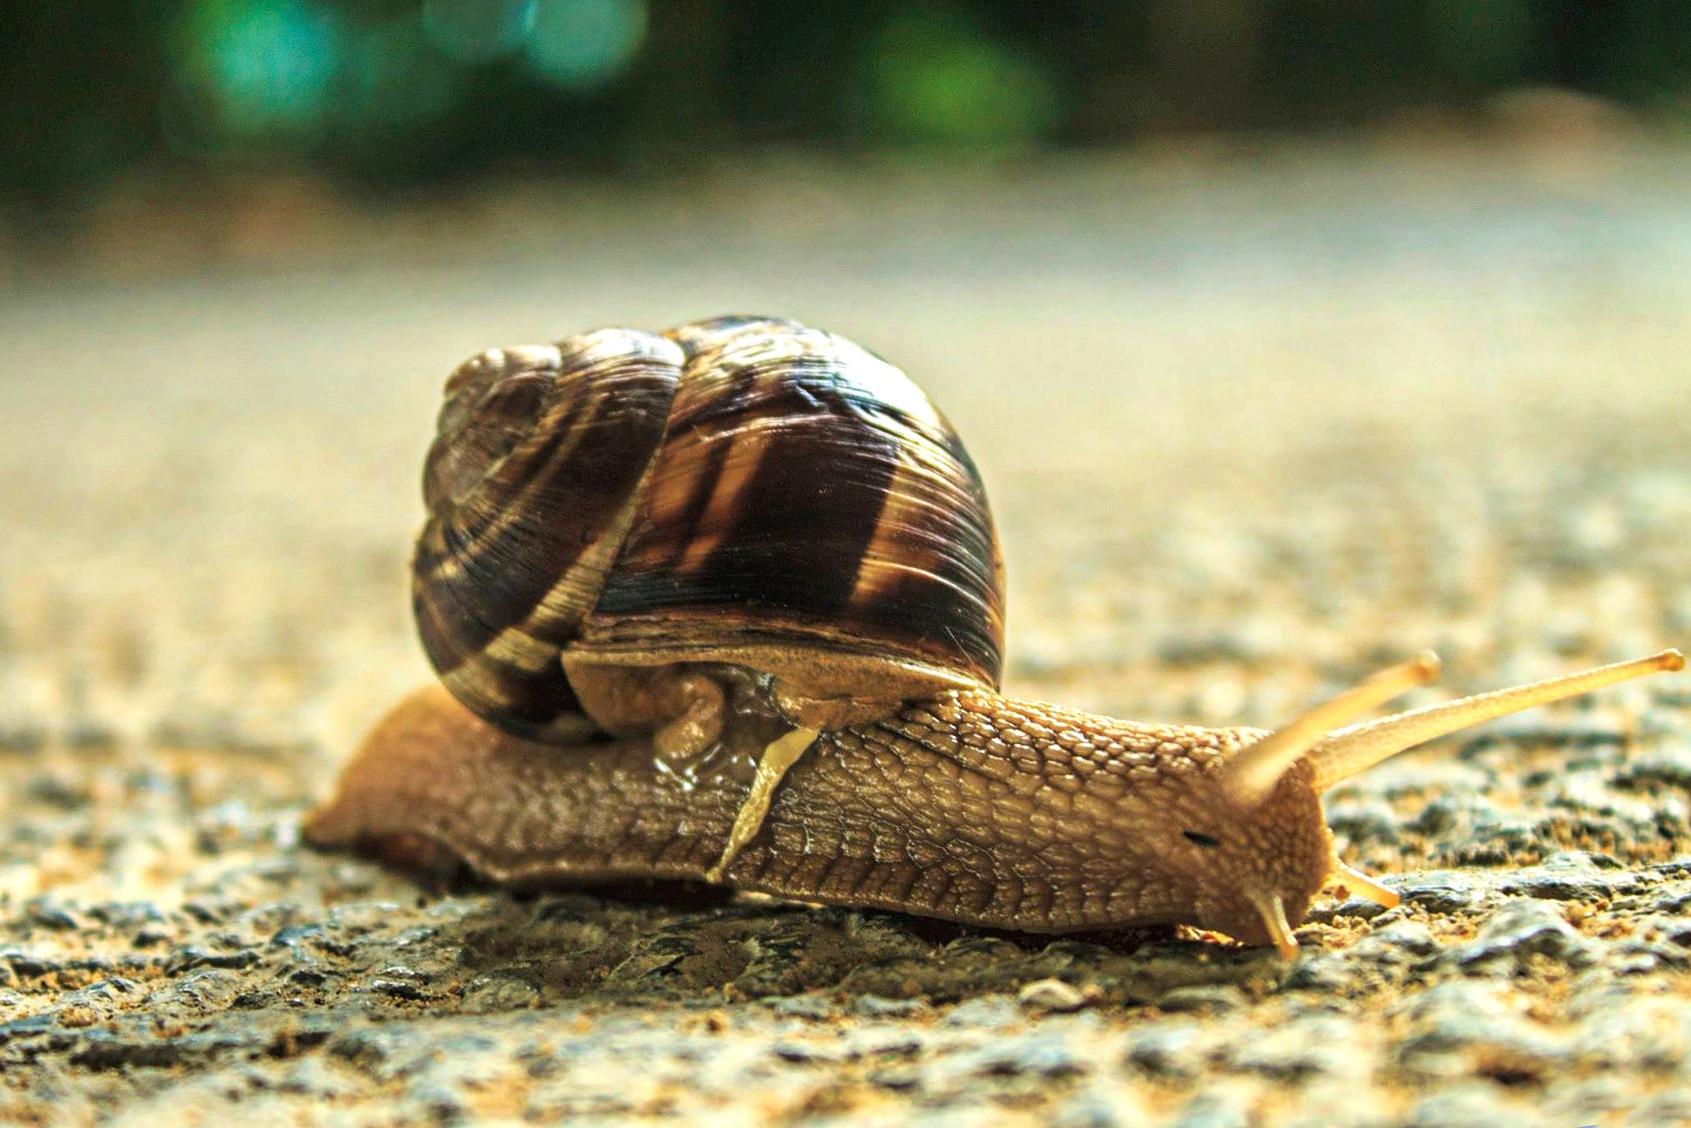 Snail by sbolkan